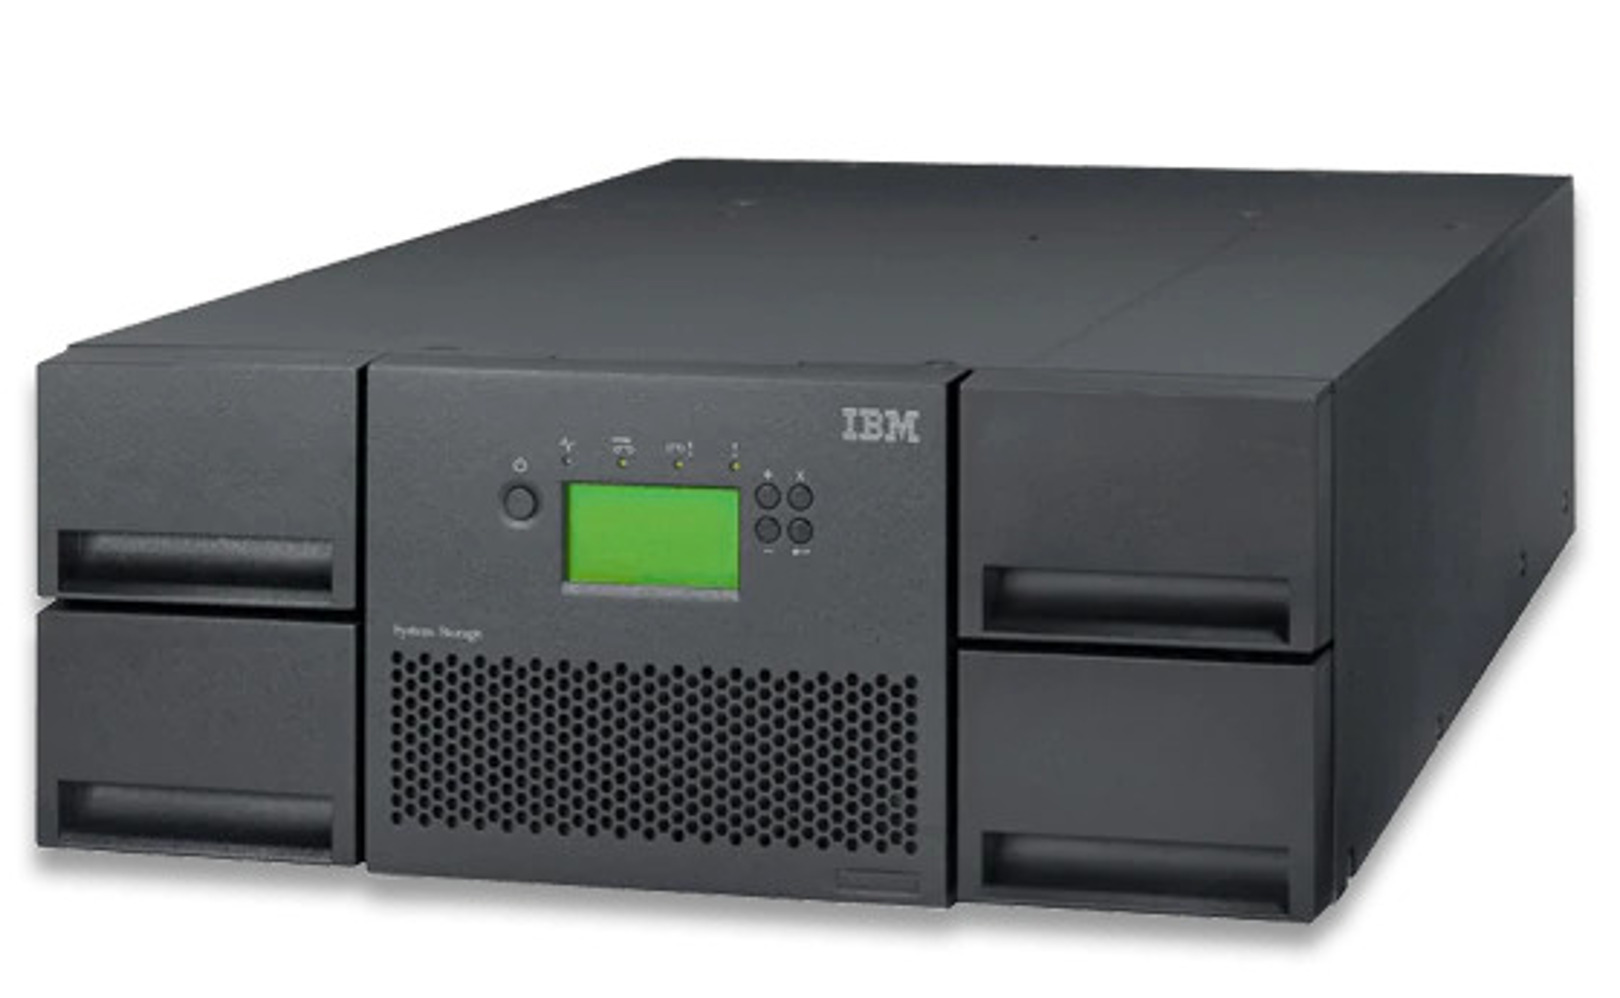 IBM TS3200 Tape Library